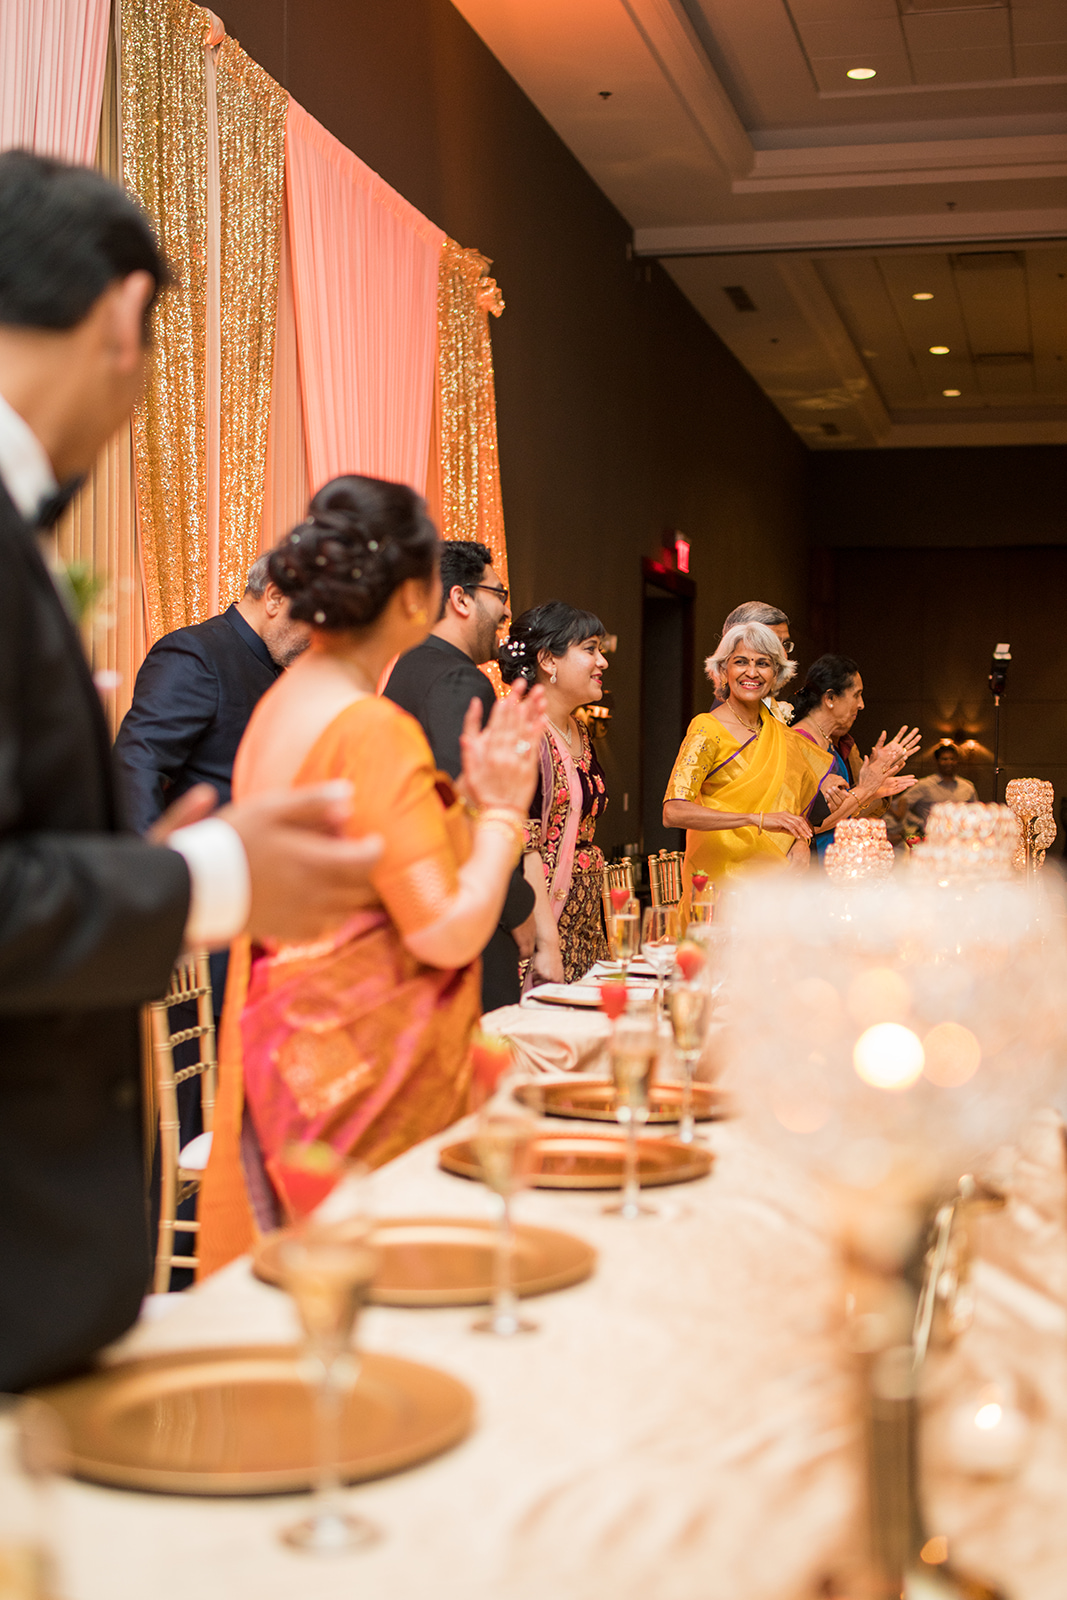 Le Cape Weddings - South Asian Wedding - Ishani and Sidhart - Wedding Reception-14.jpg